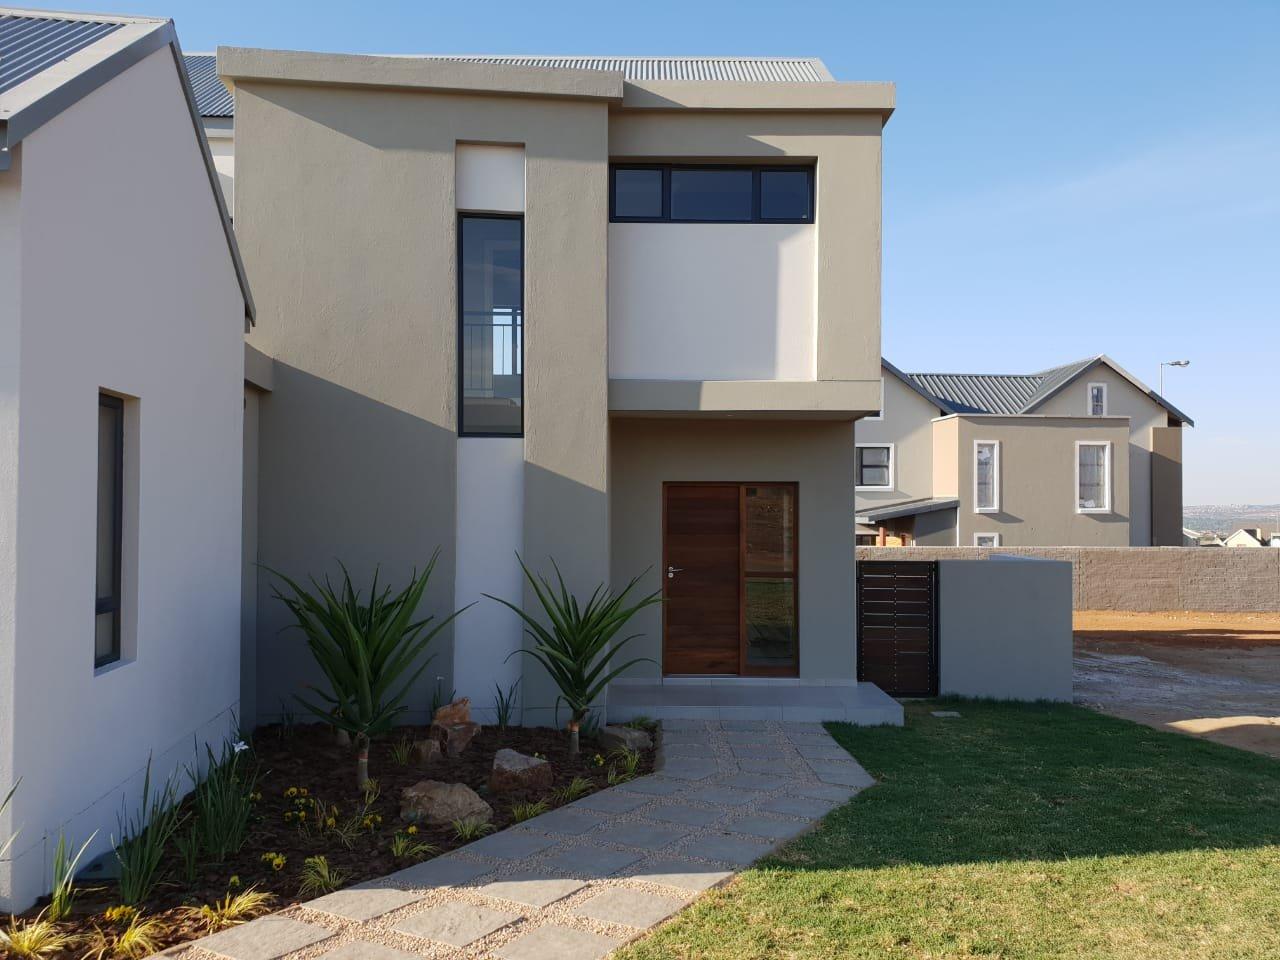 Centurion, Louwlardia Property  | Houses For Sale Louwlardia, Louwlardia, House 3 bedrooms property for sale Price:2,600,000